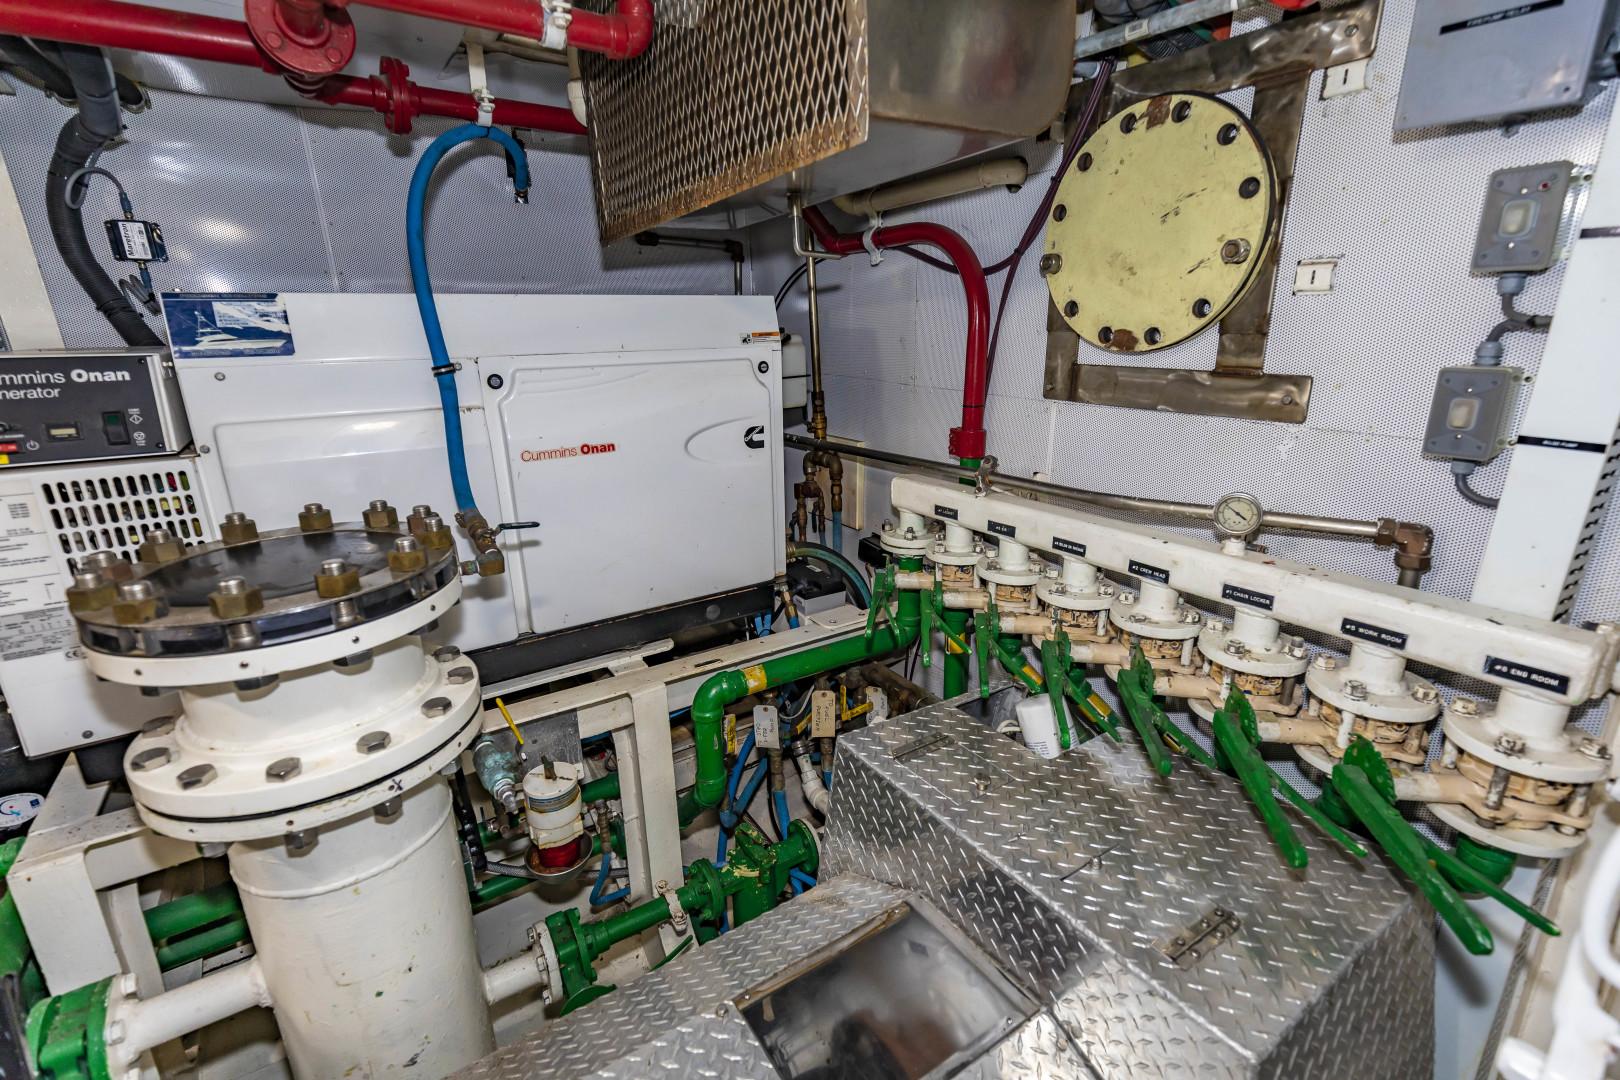 GlassTech-Expedition Yacht 2018-Reset Stuart-Florida-United States-Fuel Manifolds-1570482 | Thumbnail